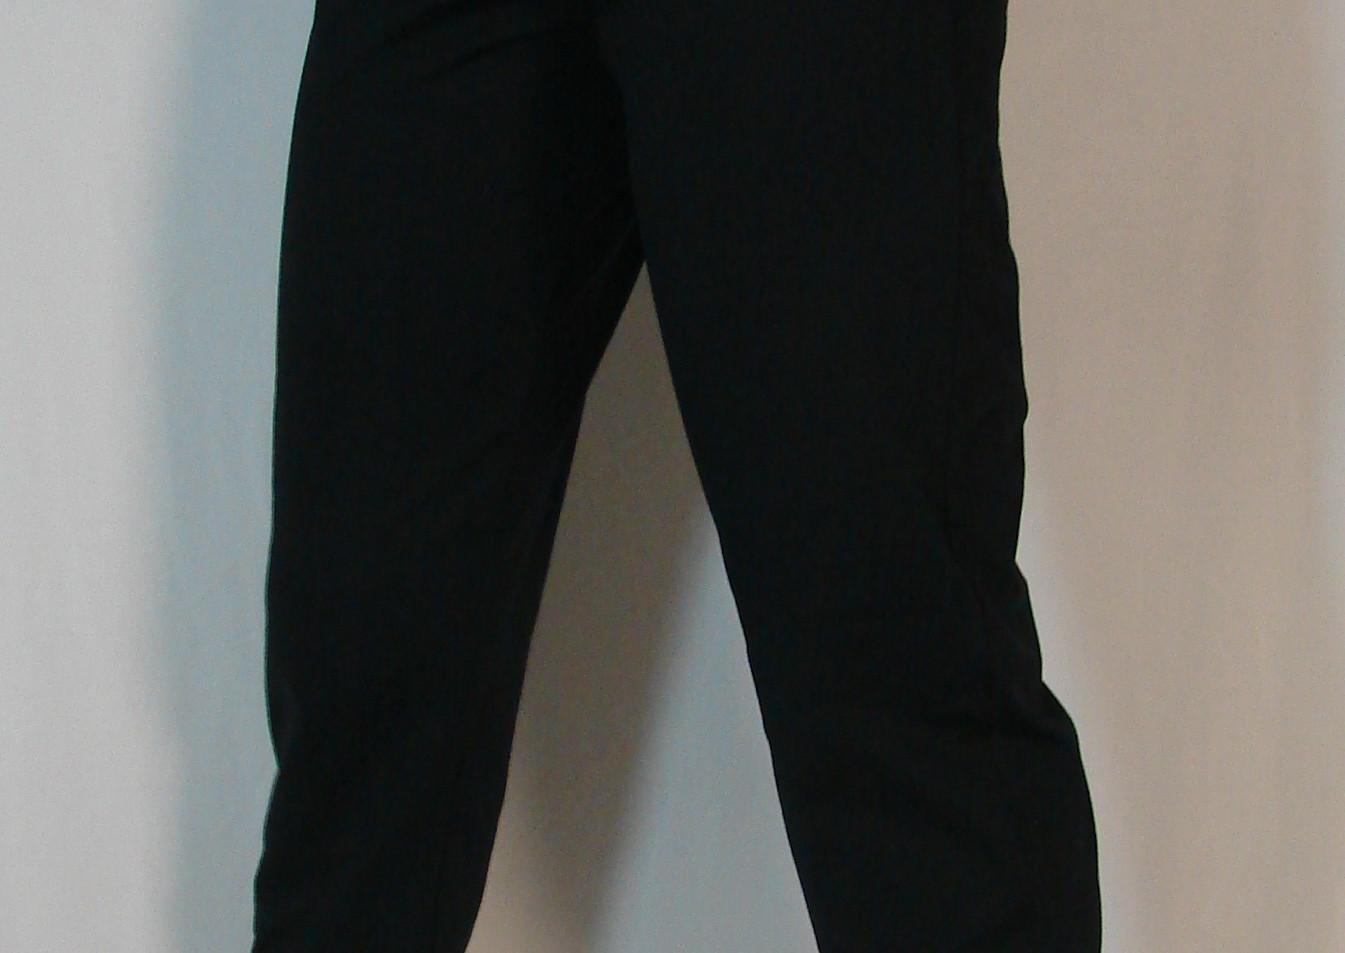 Pantalon fuseau sportif - Côté / Sport peg pants - Side